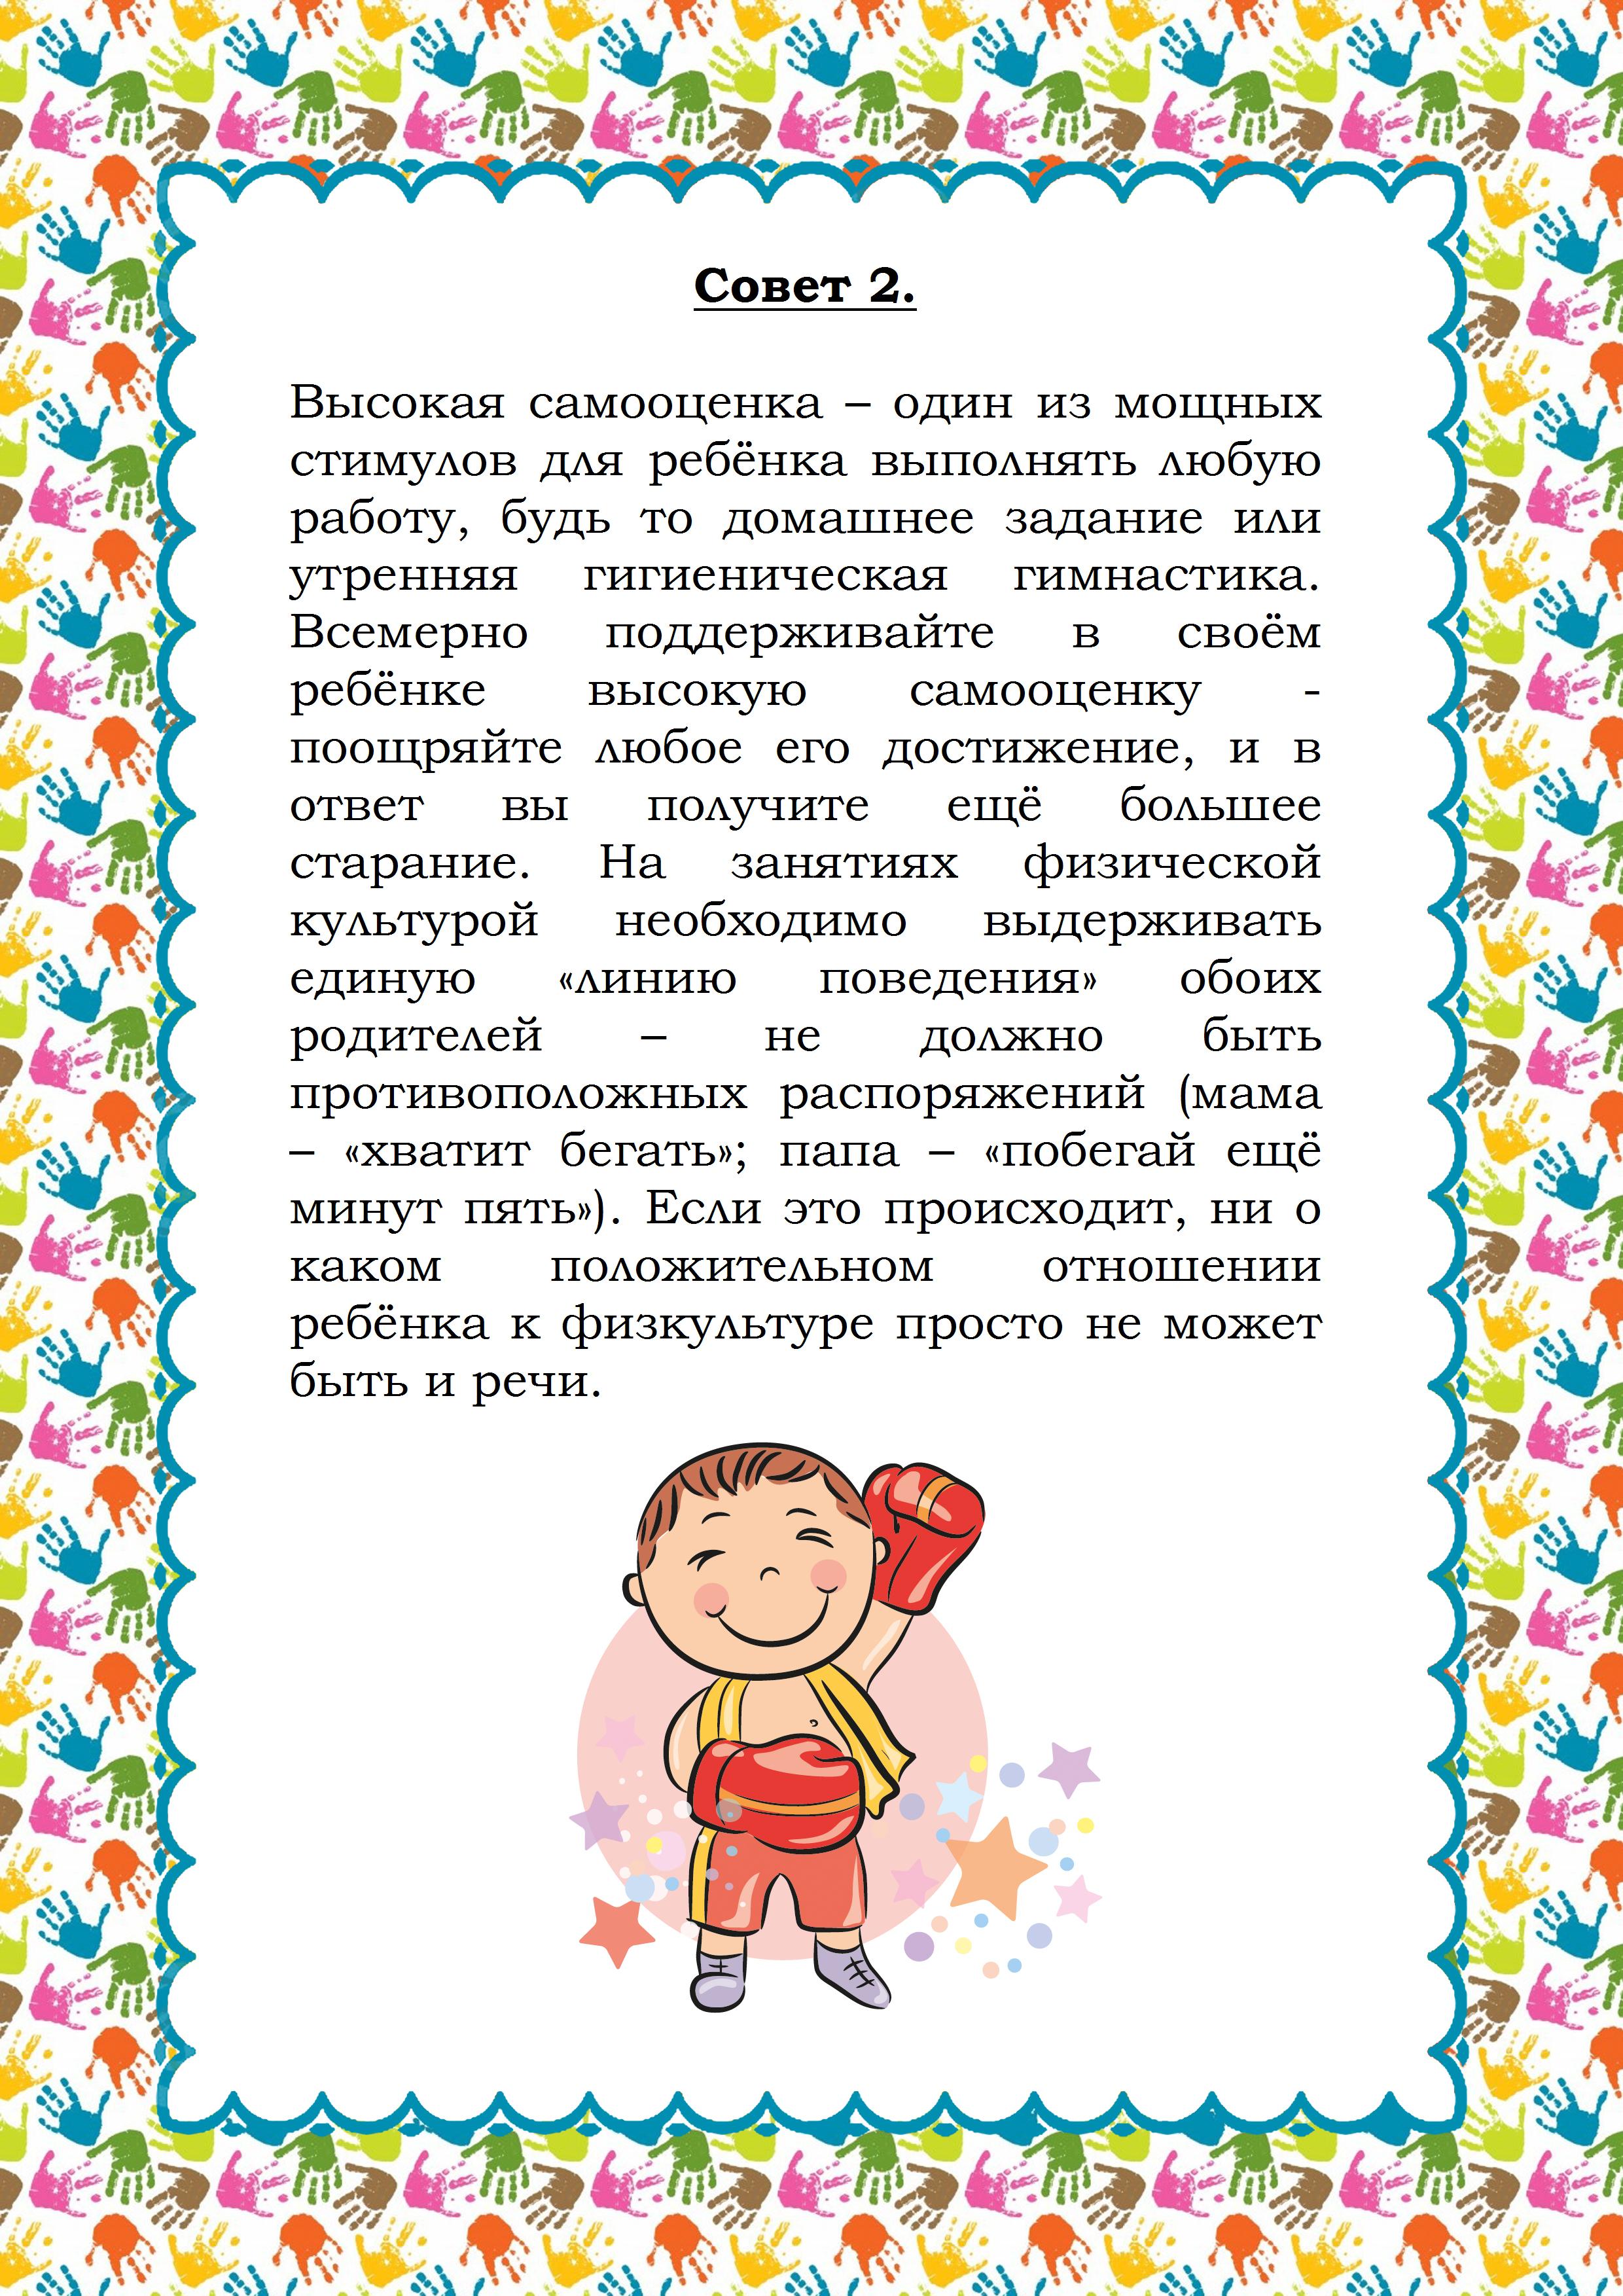 hello_html_m5ab8e949.jpg